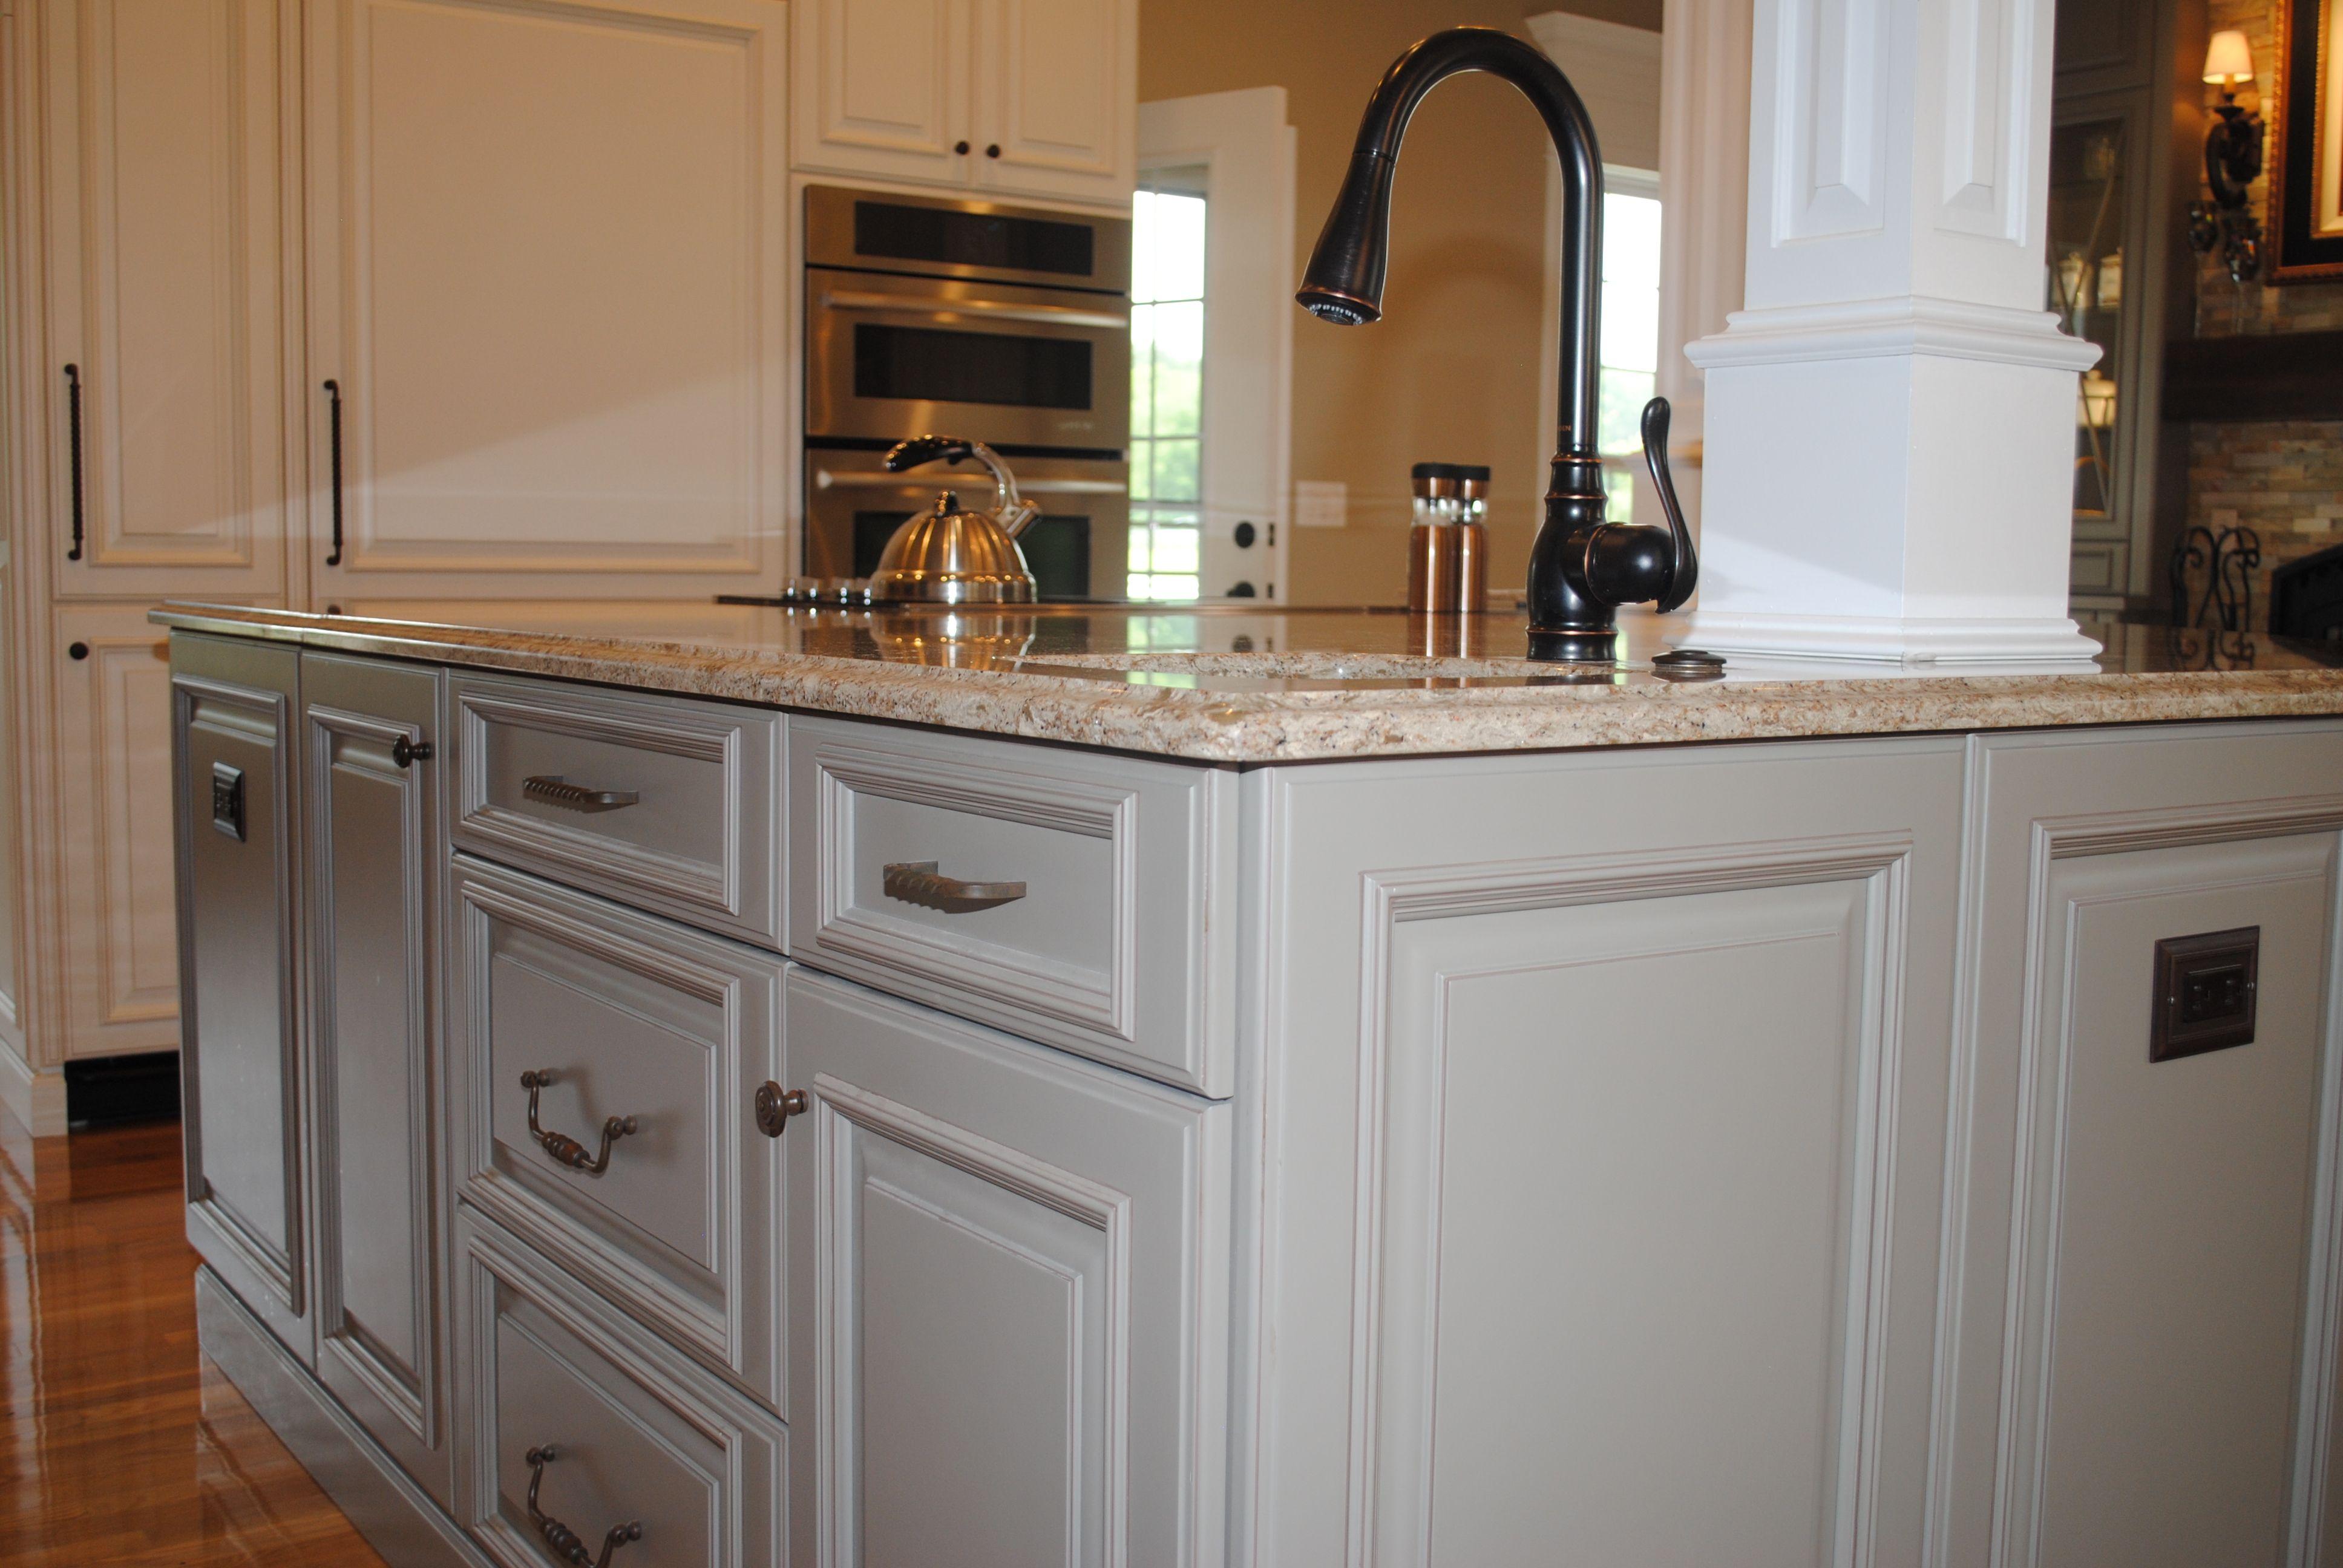 Cabinets Plus Design Glenn Kitchen Smithport Cabinetry Island